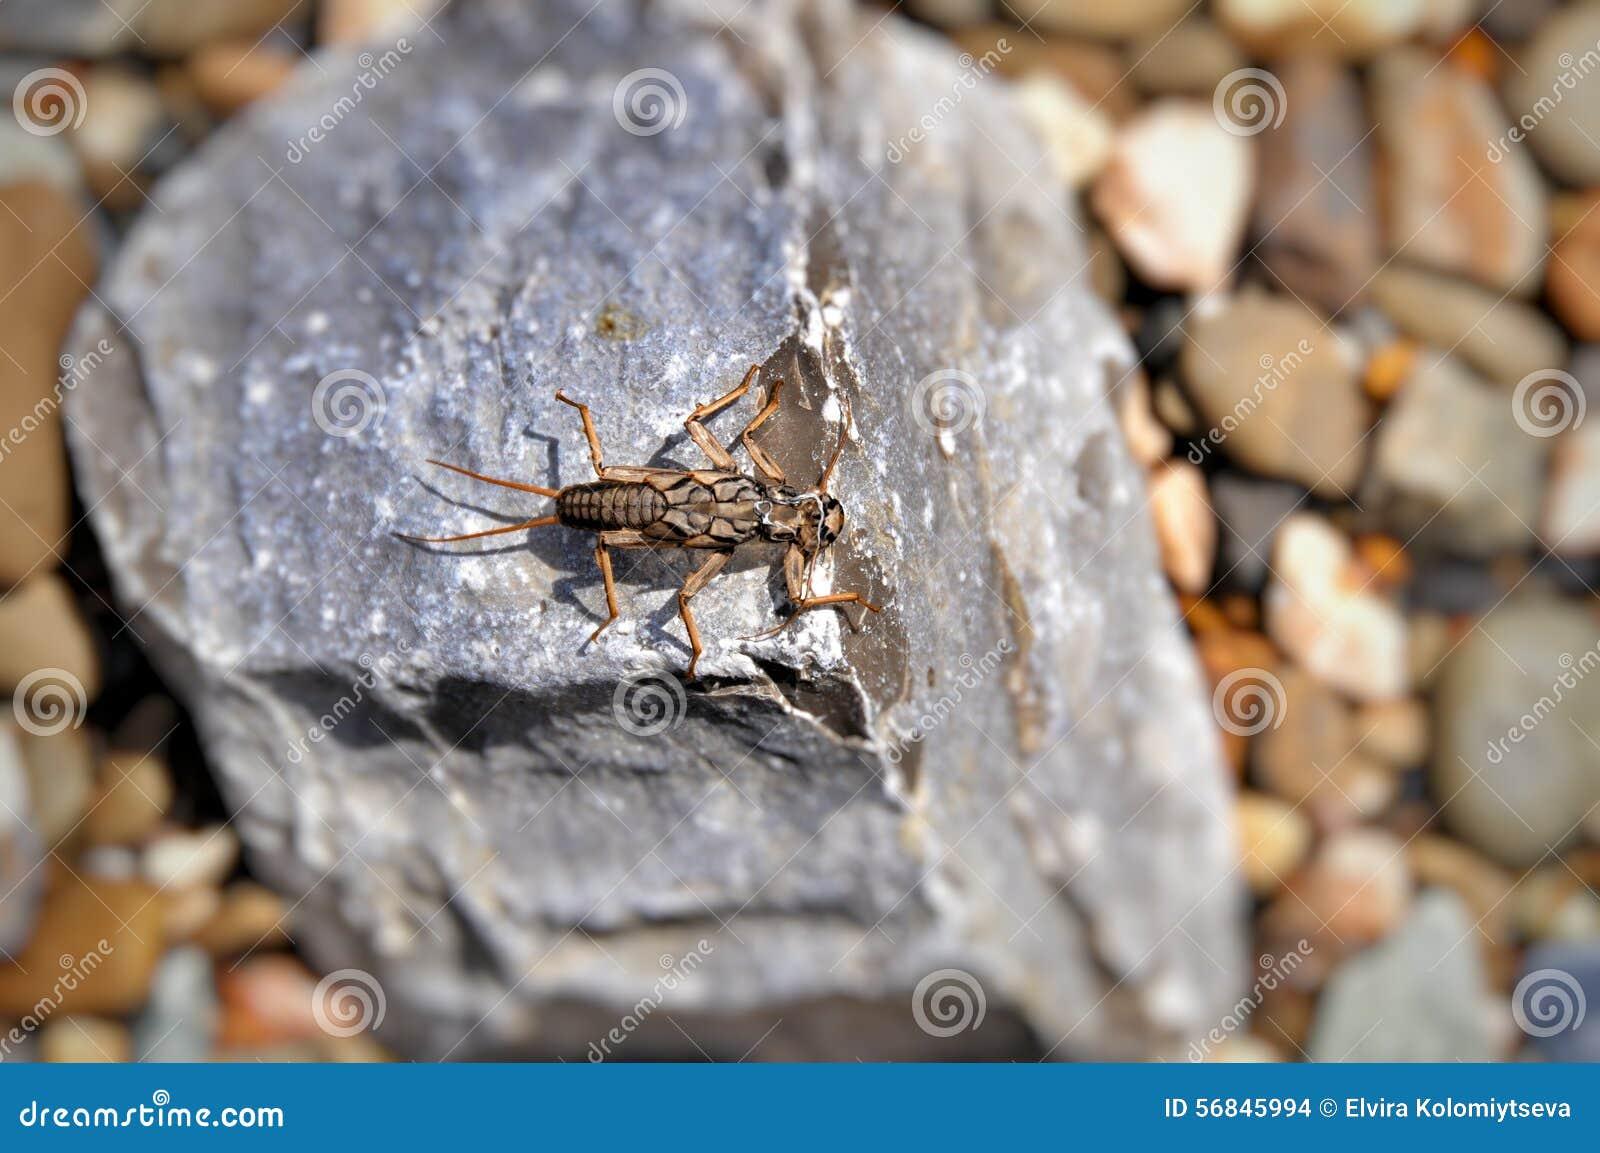 Erro - os caddis da larva voam (o Plecoptera)